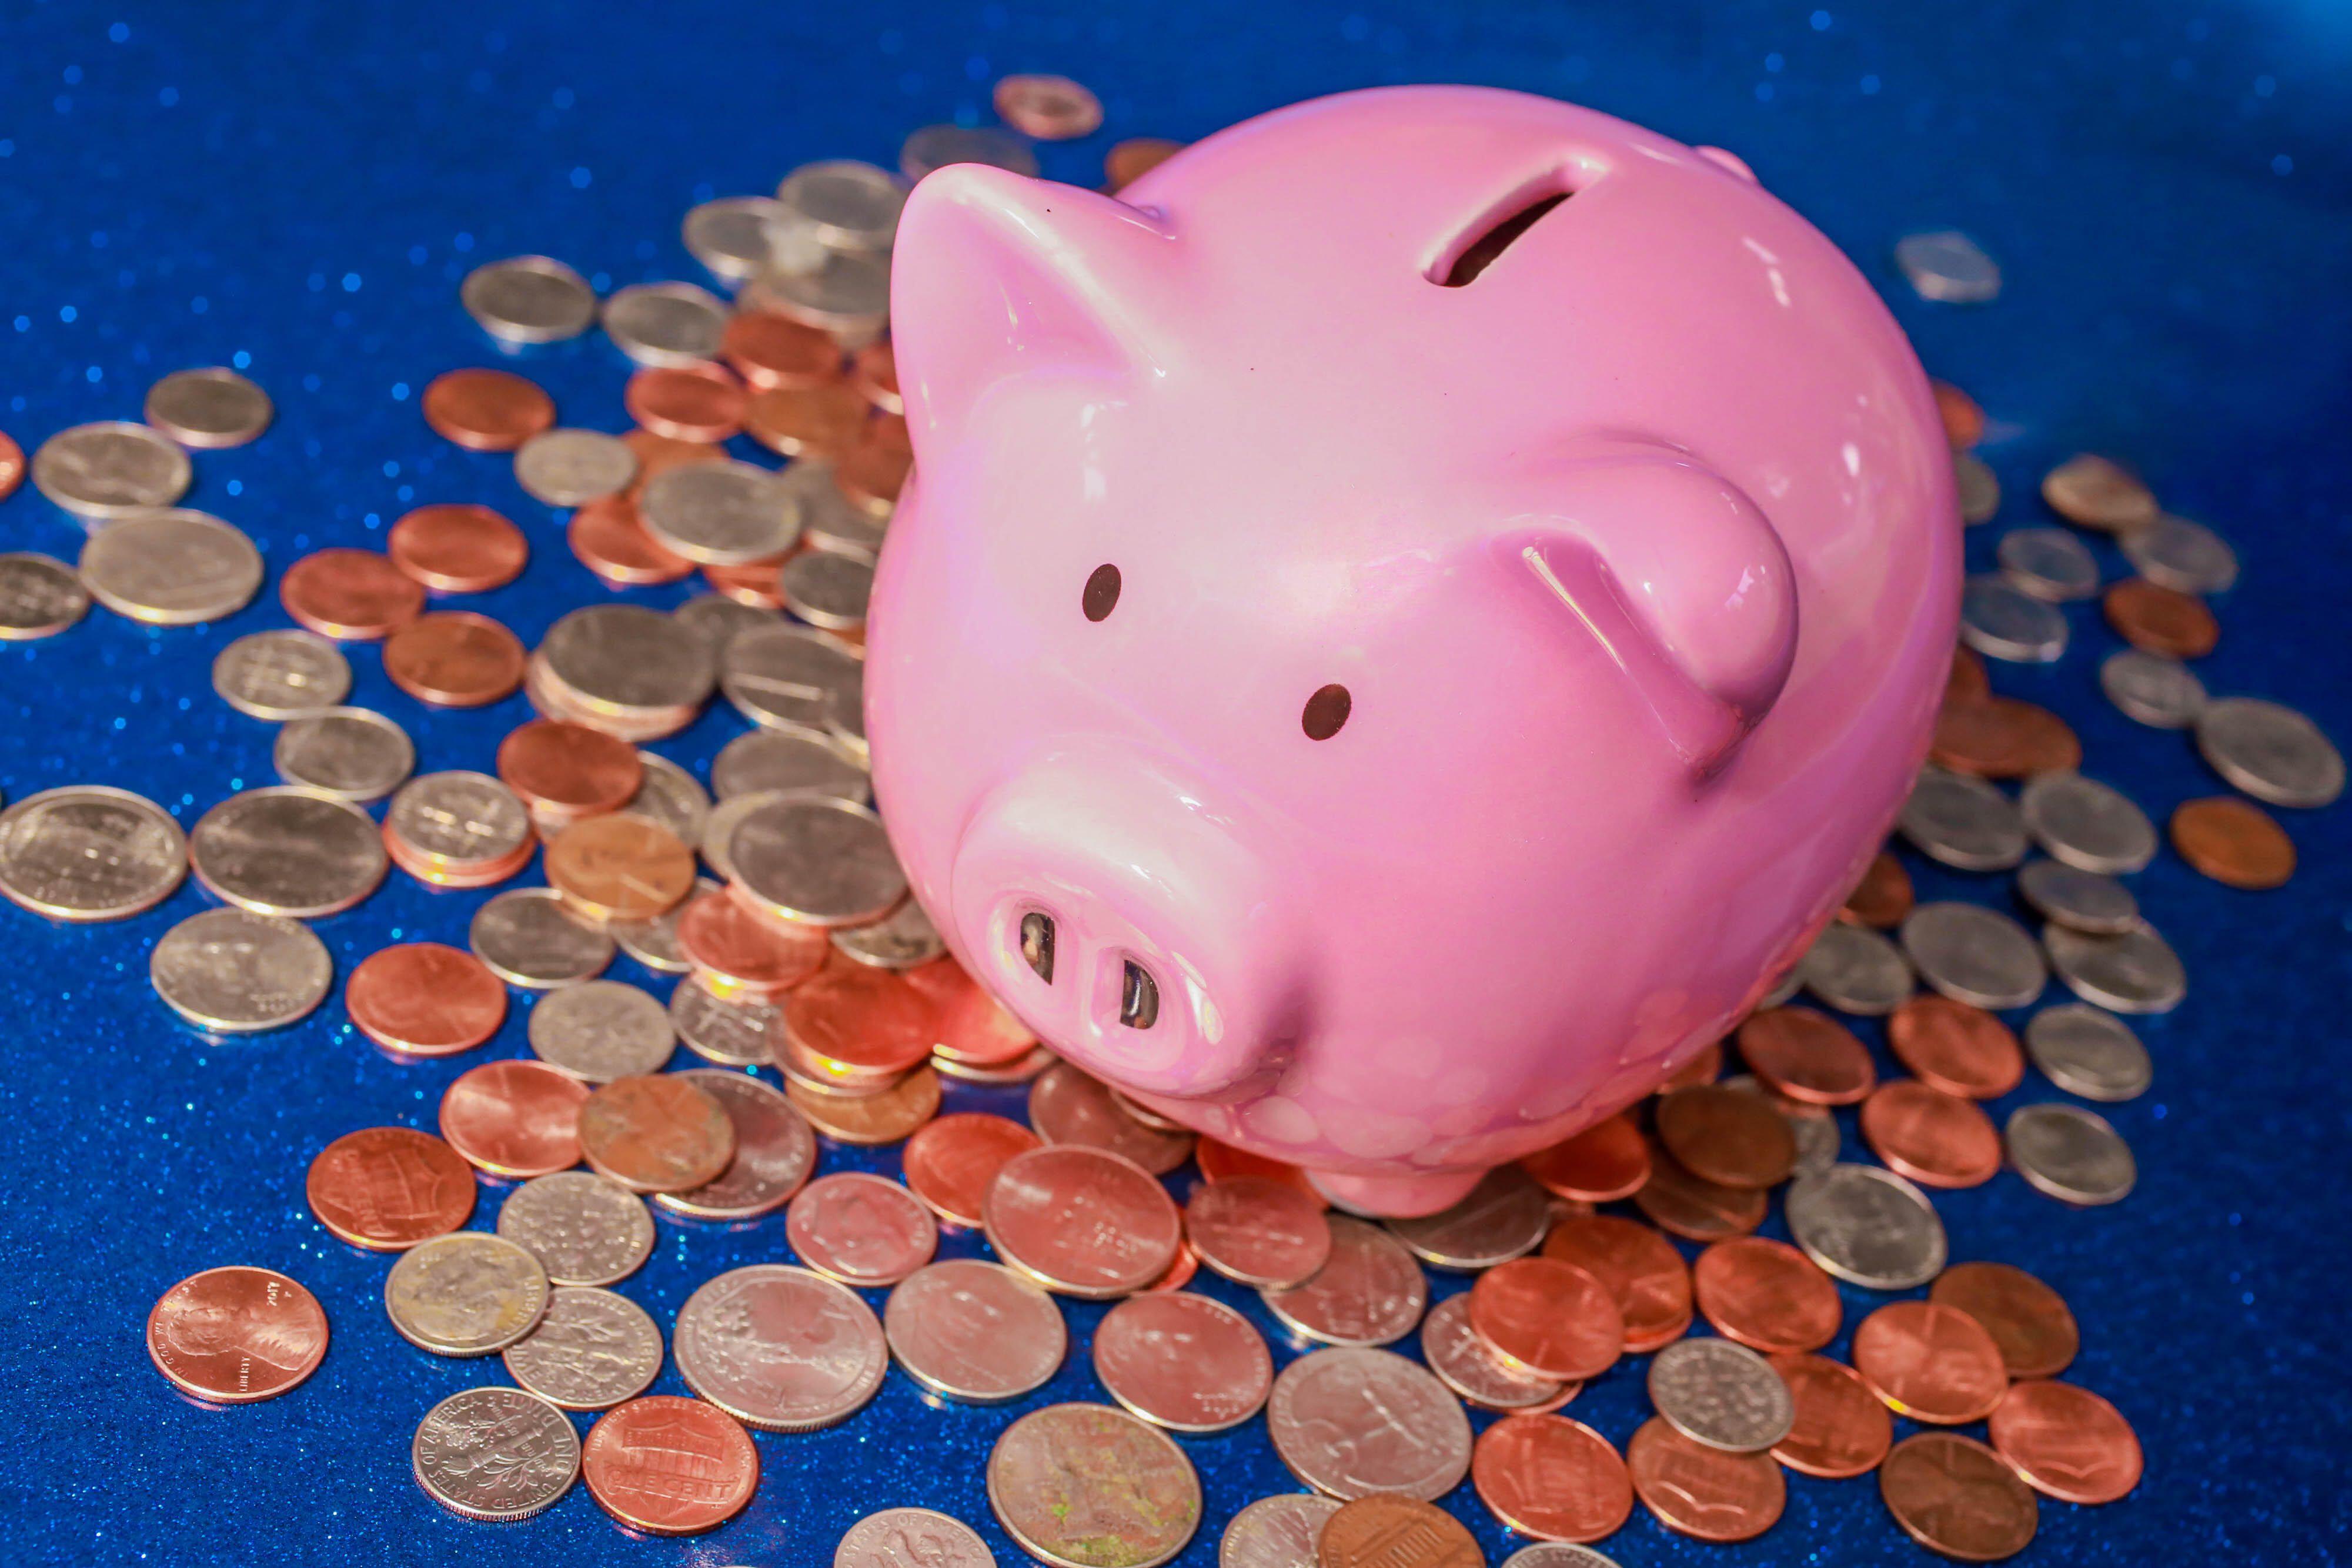 breaking-the-piggy-bank-stimulus-check-cash-money-savings-debt-personal-finance-005